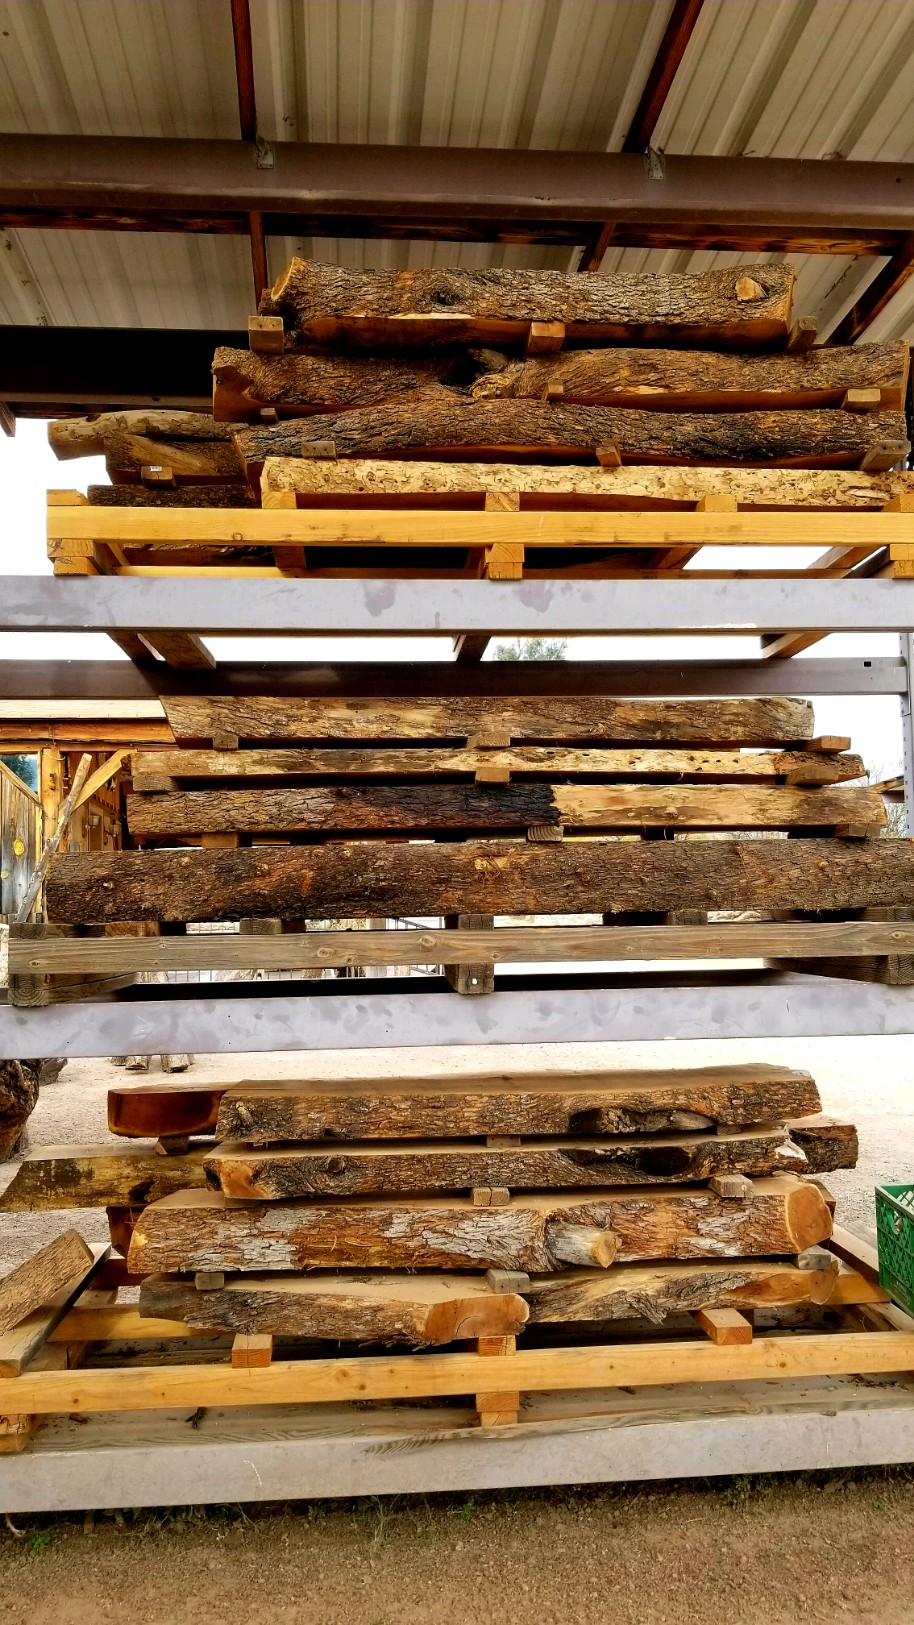 Mesquite mantel candidates (rough cut, unfinished)